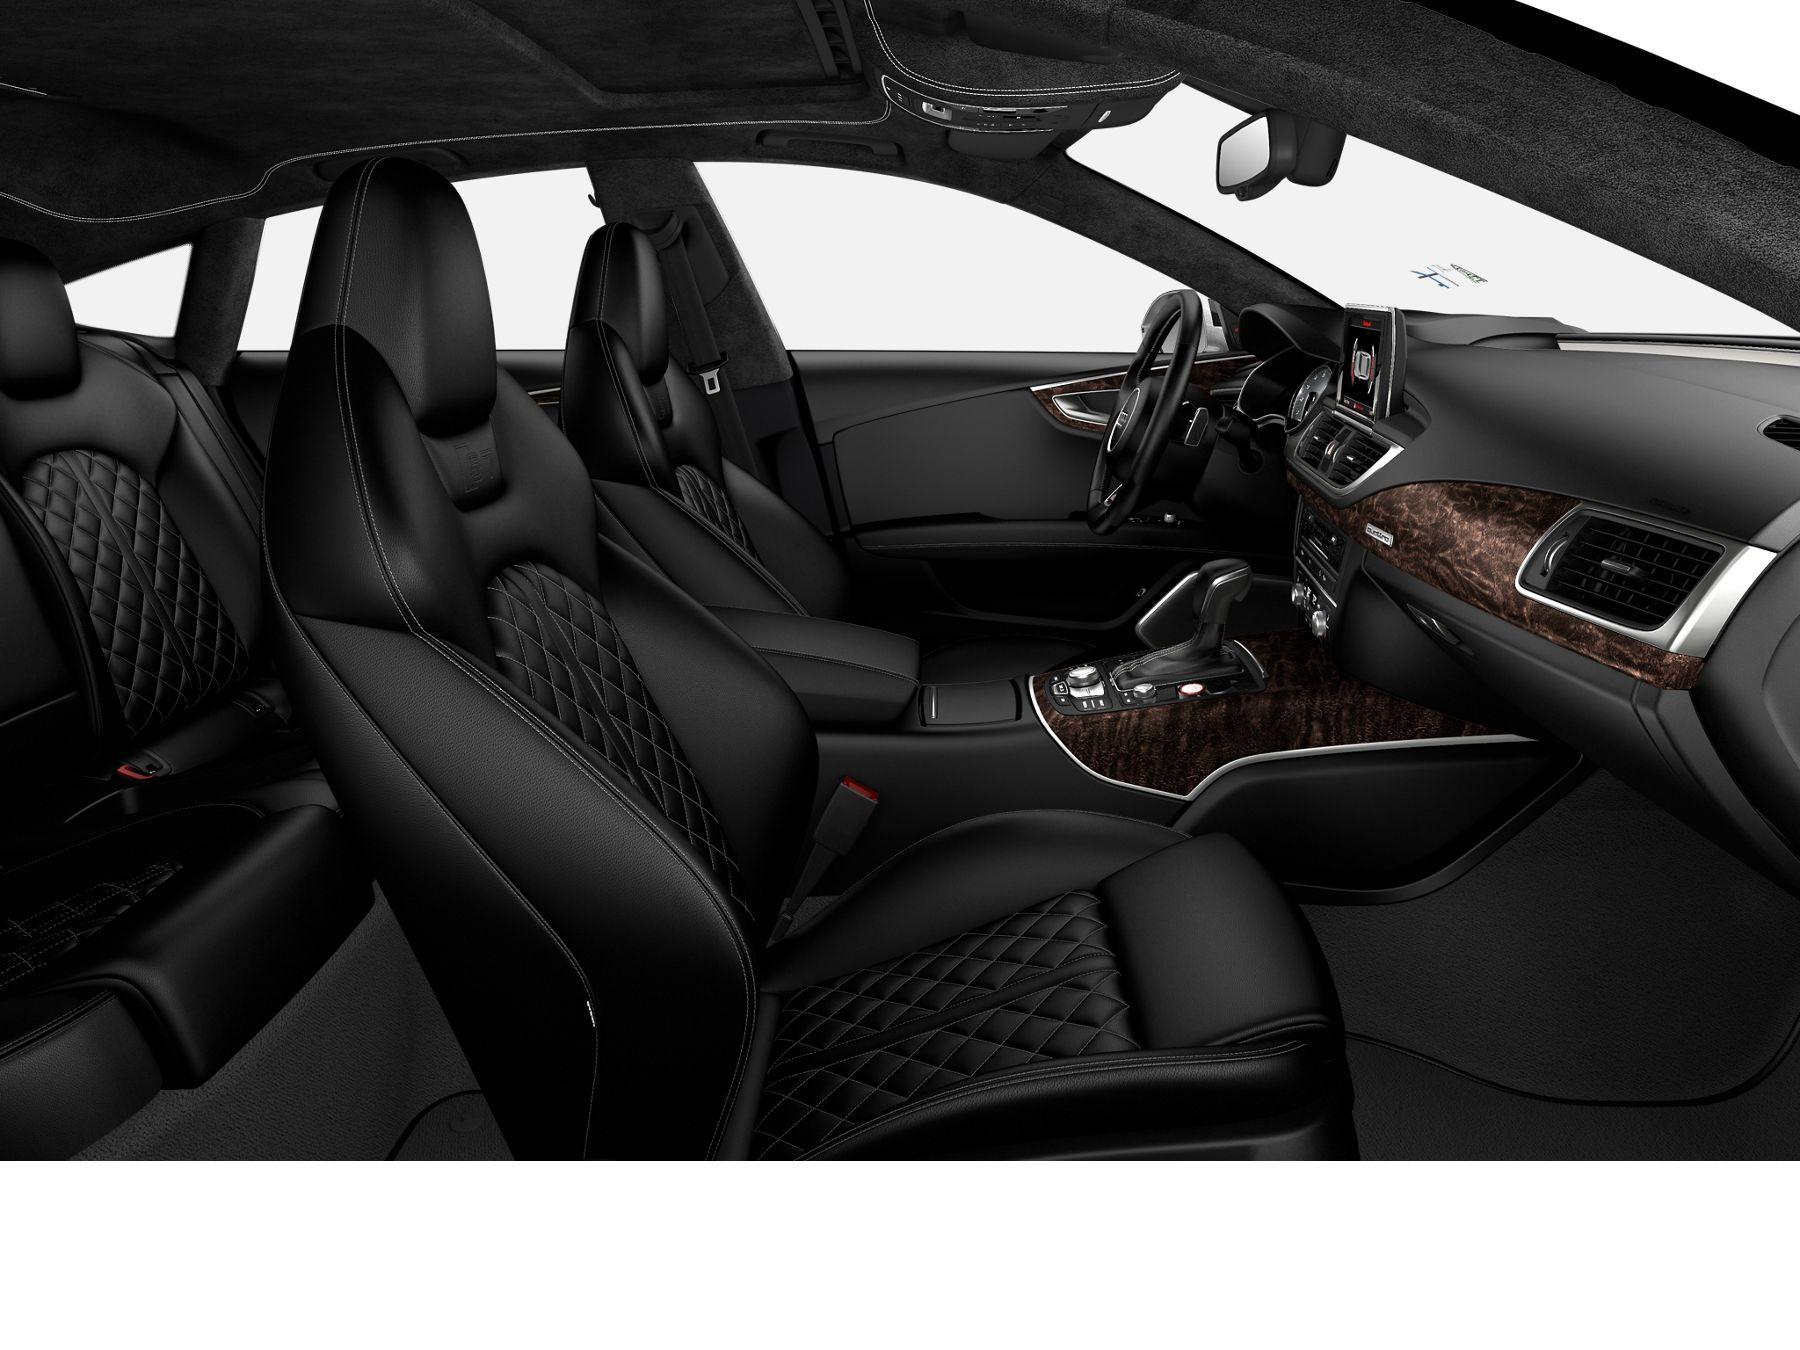 Build your own Audi S7 Sedan Car configurator Audi USA